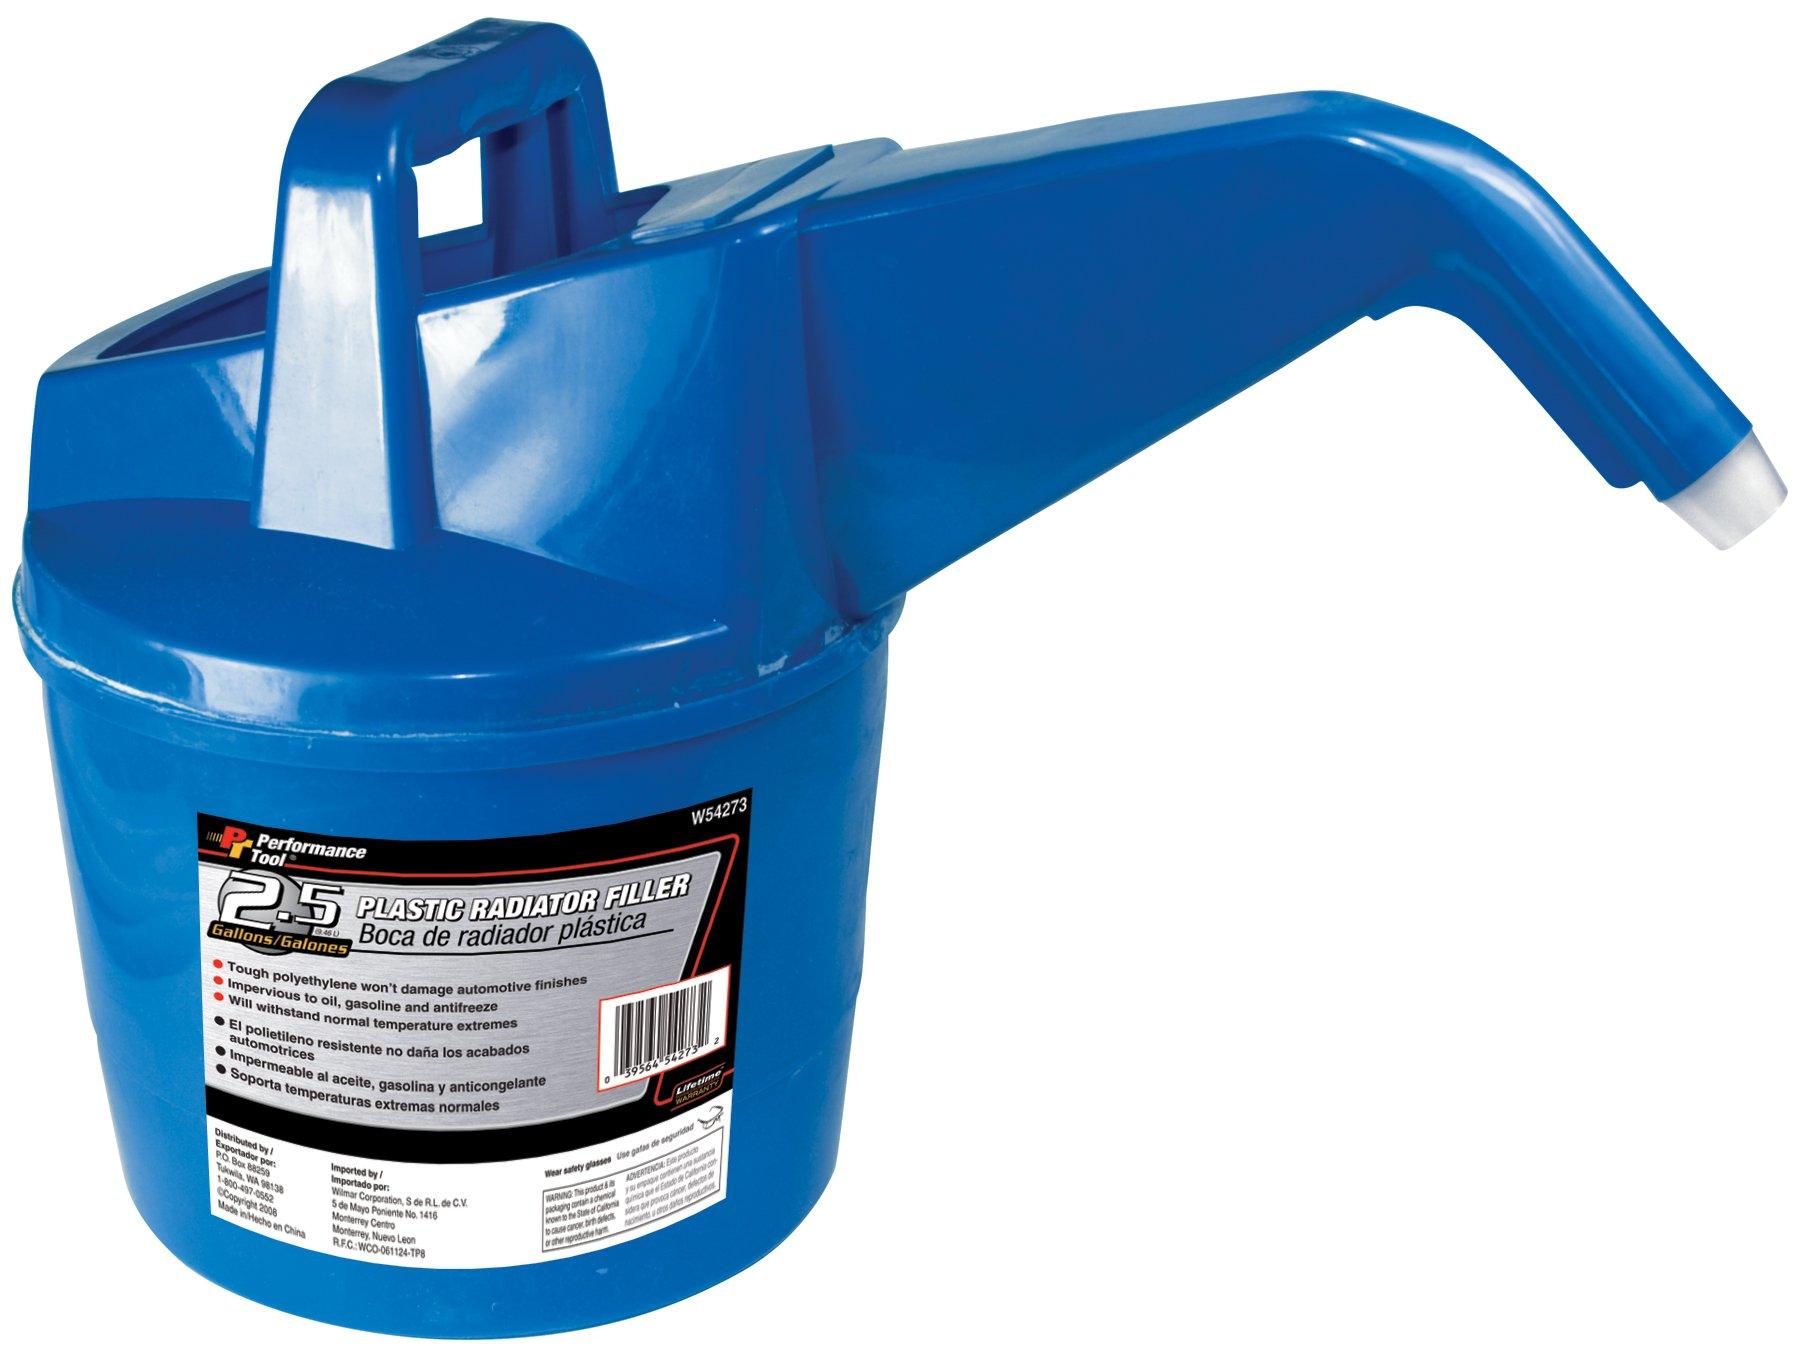 Performance Tool W54273 Plastic Radiator Filler - 2.5 Gallon